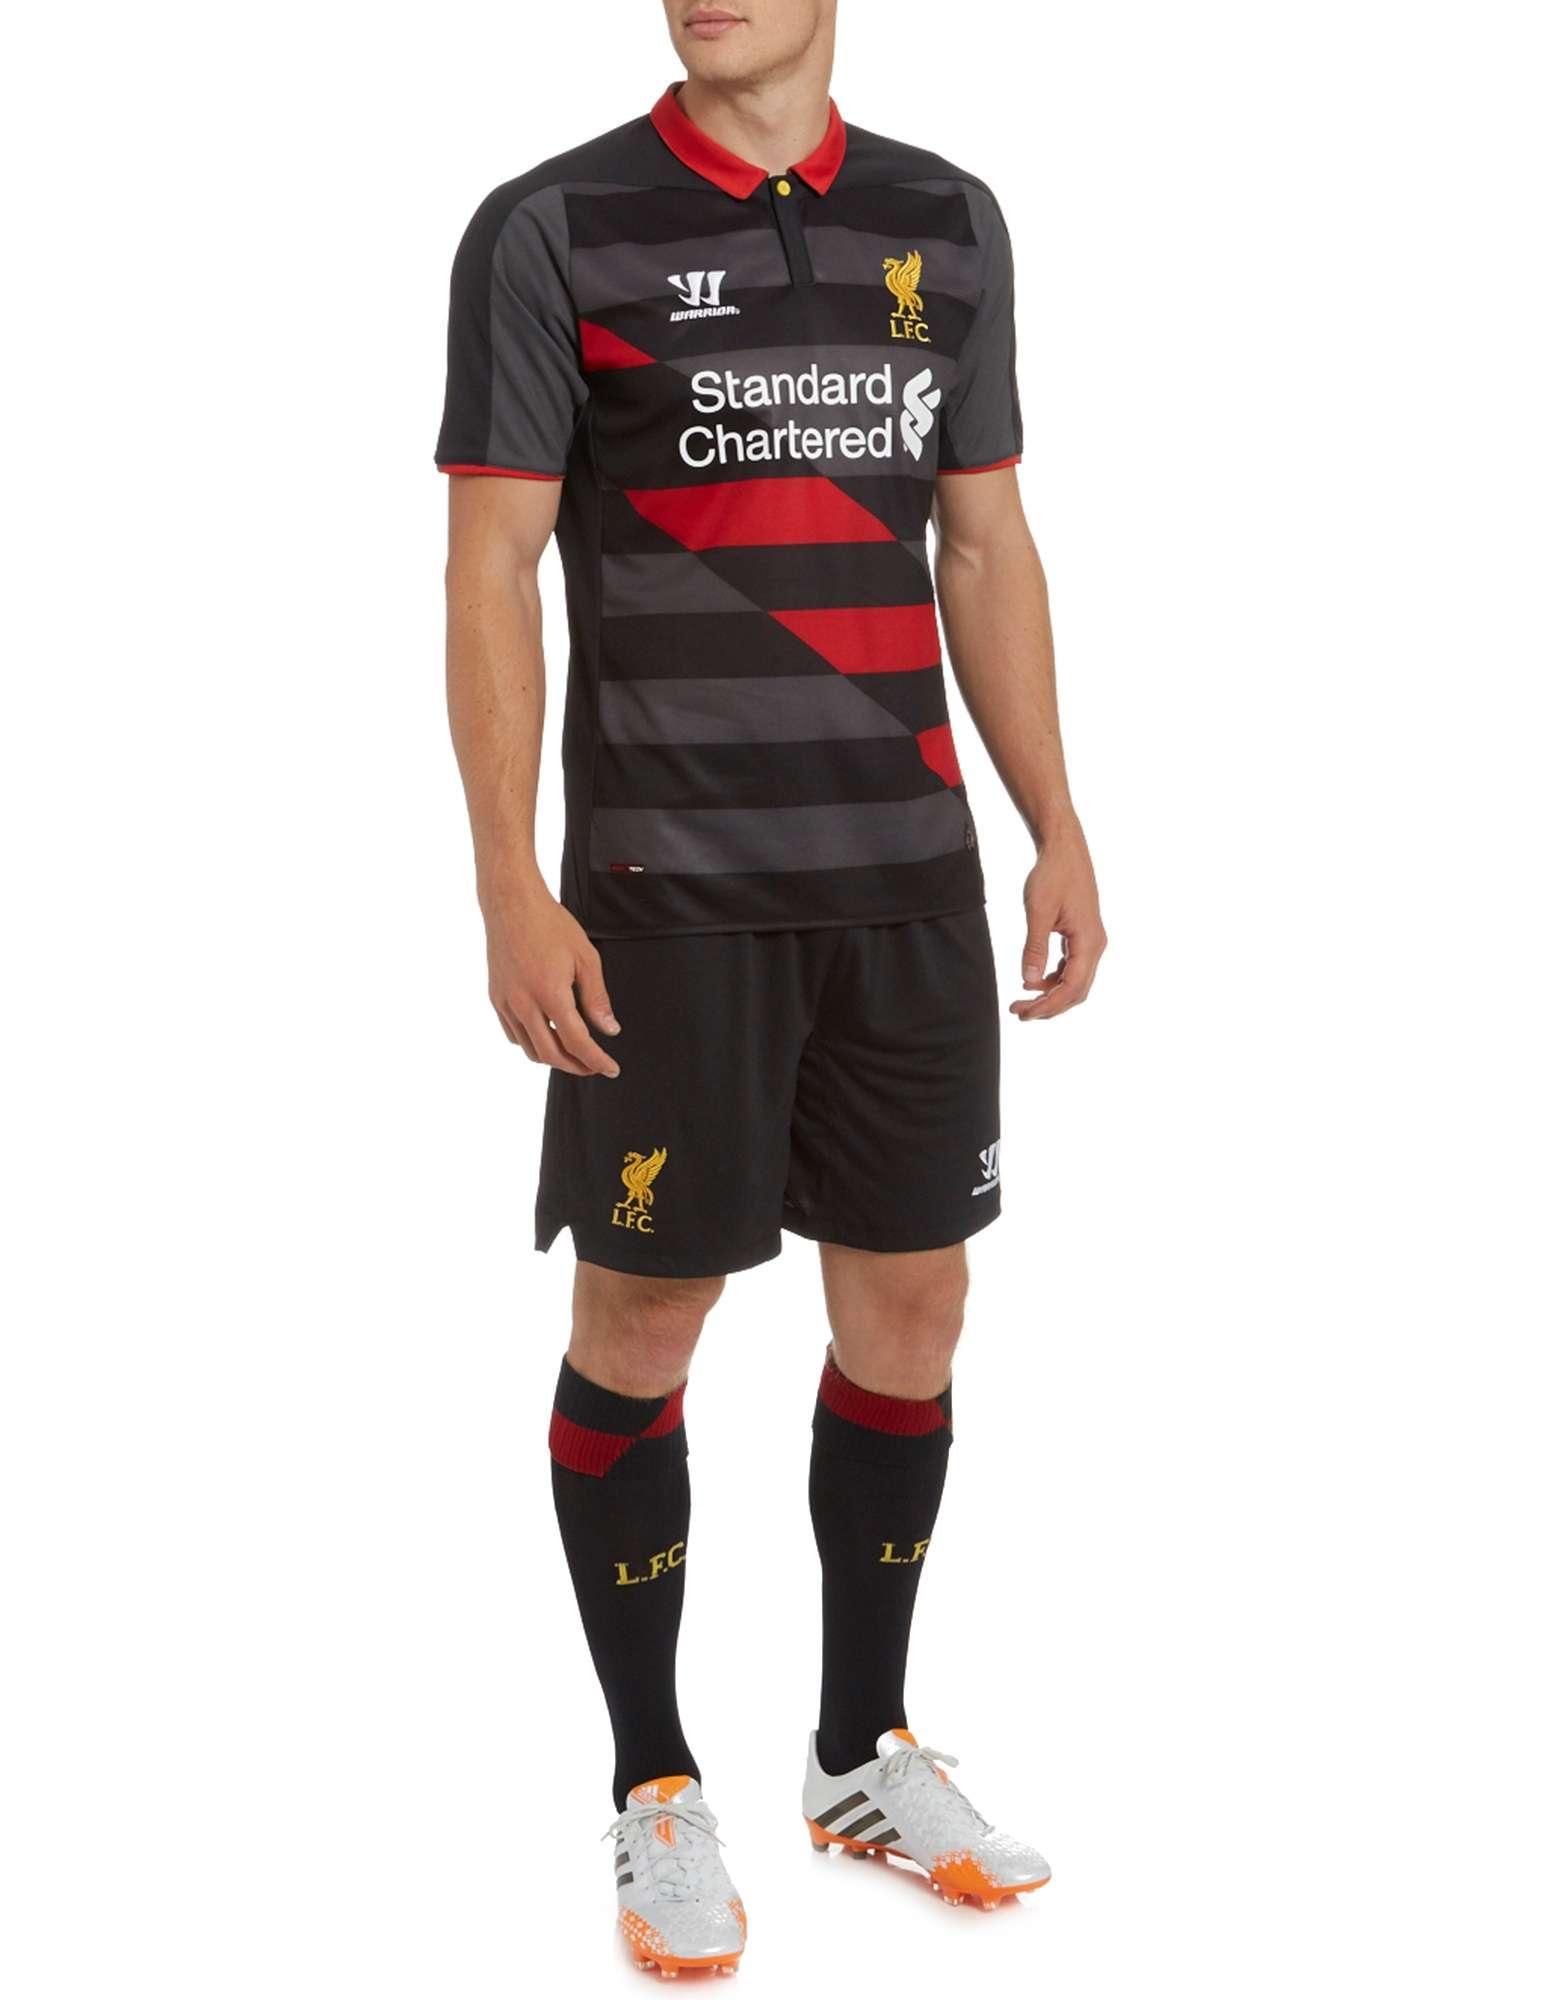 Warrior Sports Liverpool 2014 Third Shirt